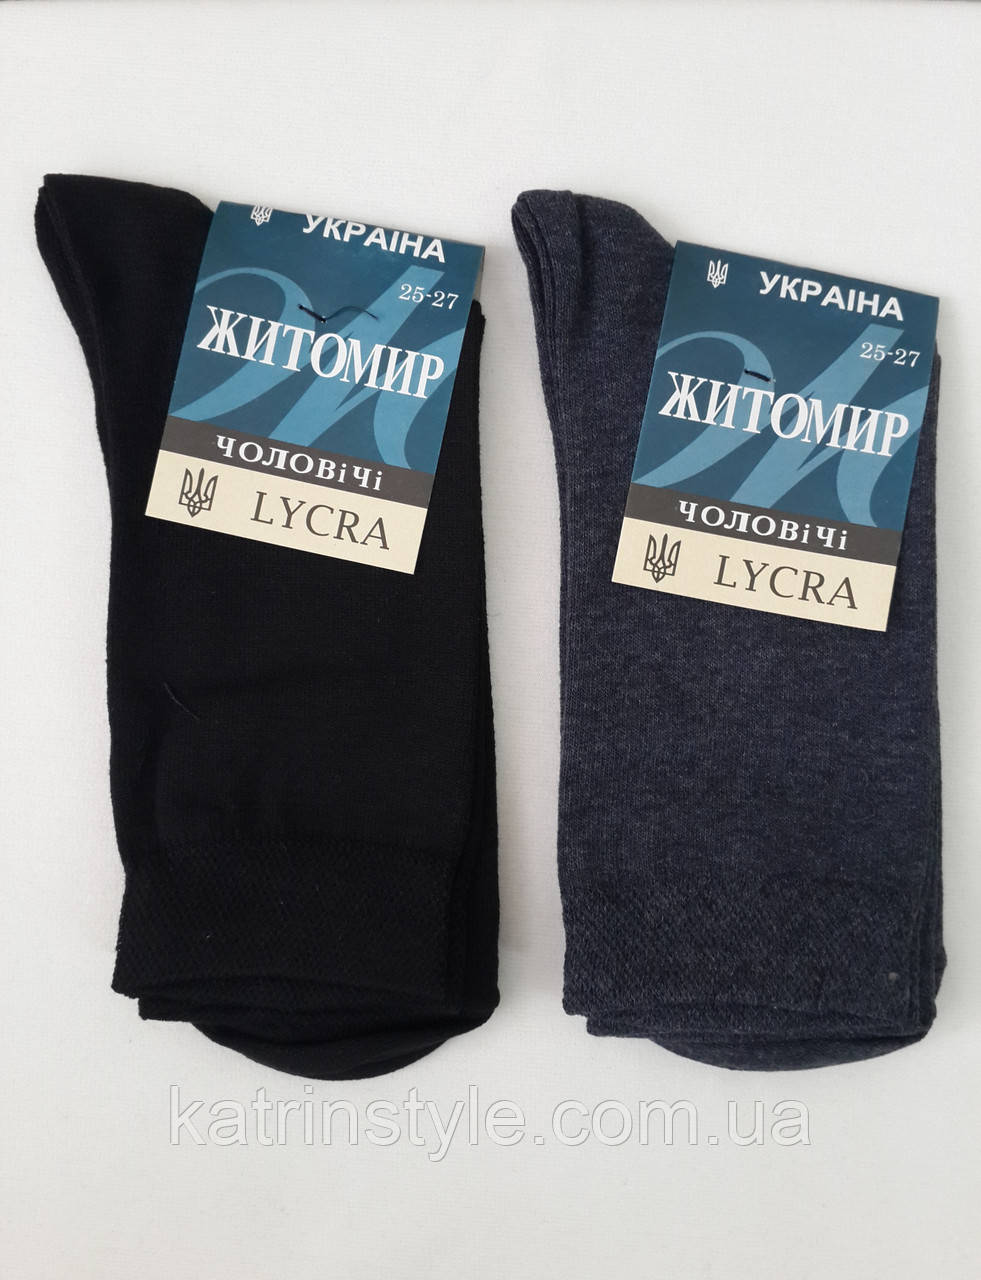 Носки мужские «Житомир» стрейч